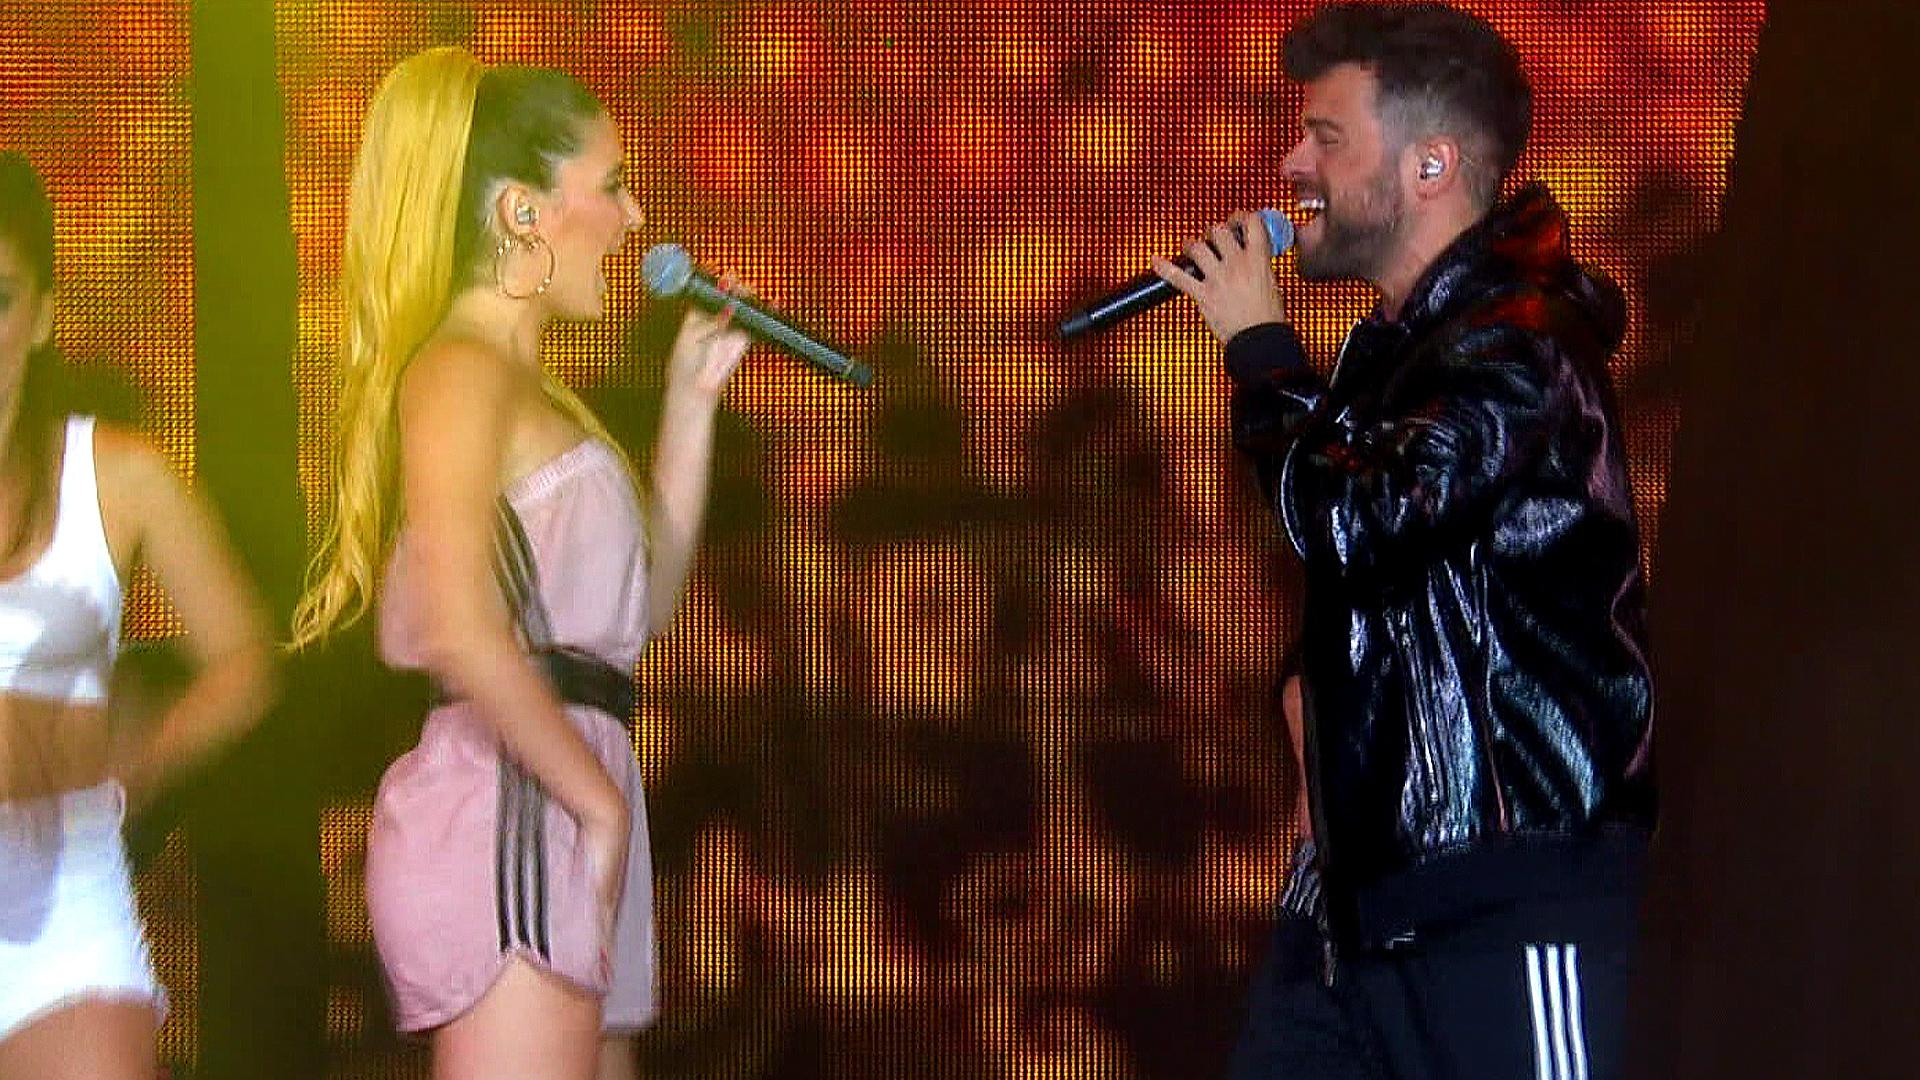 OT Bernabéu - Ricky y Mireya cantan 'Madre tierra'